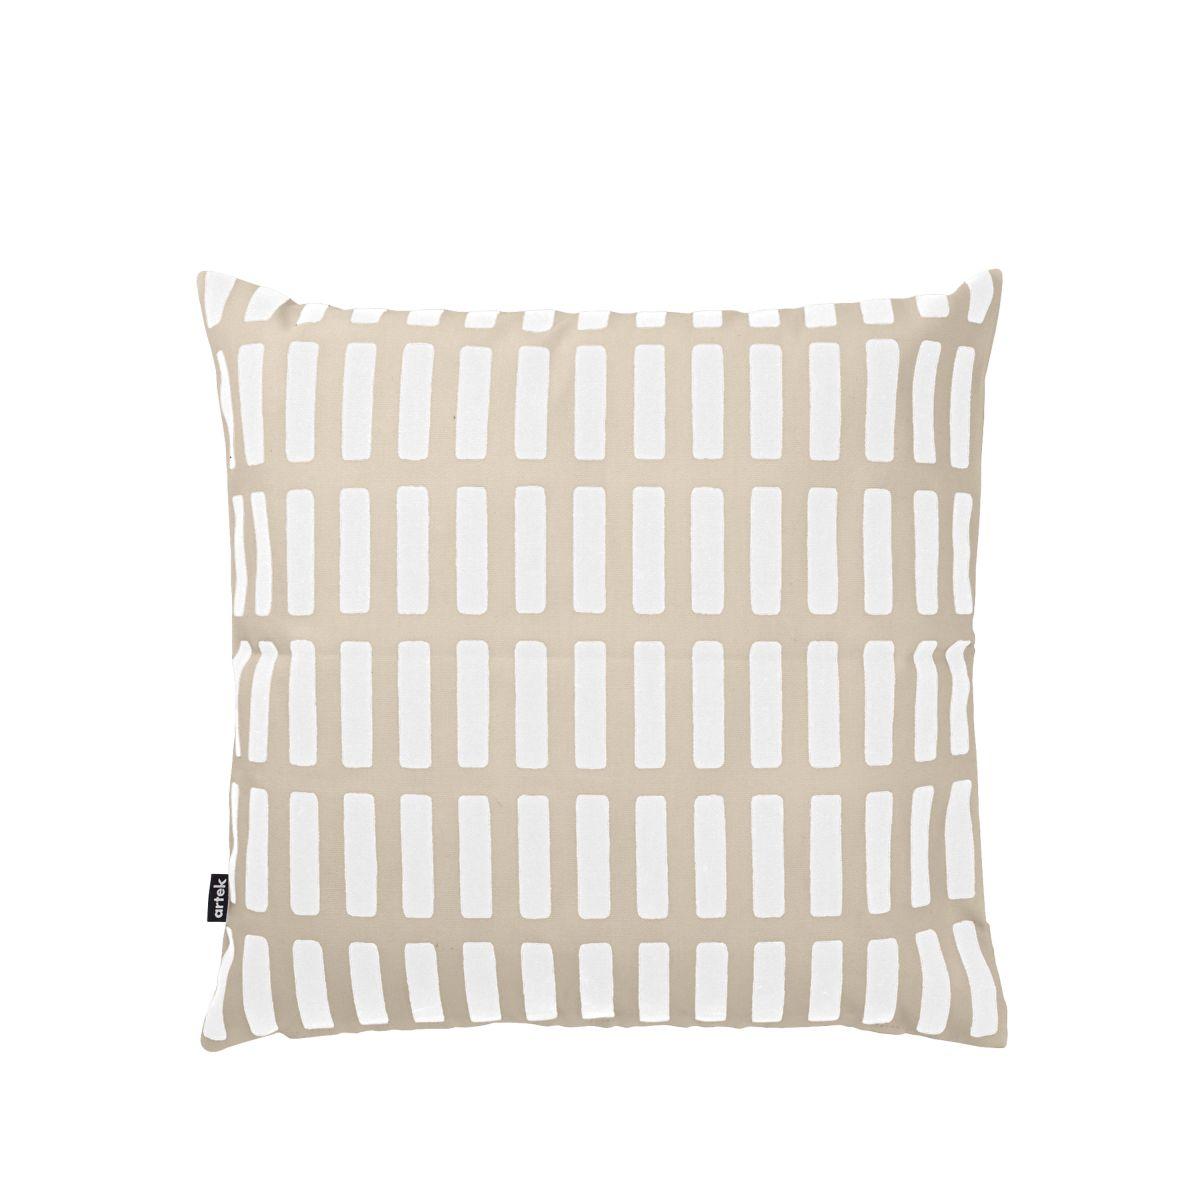 Siena-Cushion-Cover-Cotton-Canvas-small-40-x-40-cm-sand-white-3976677